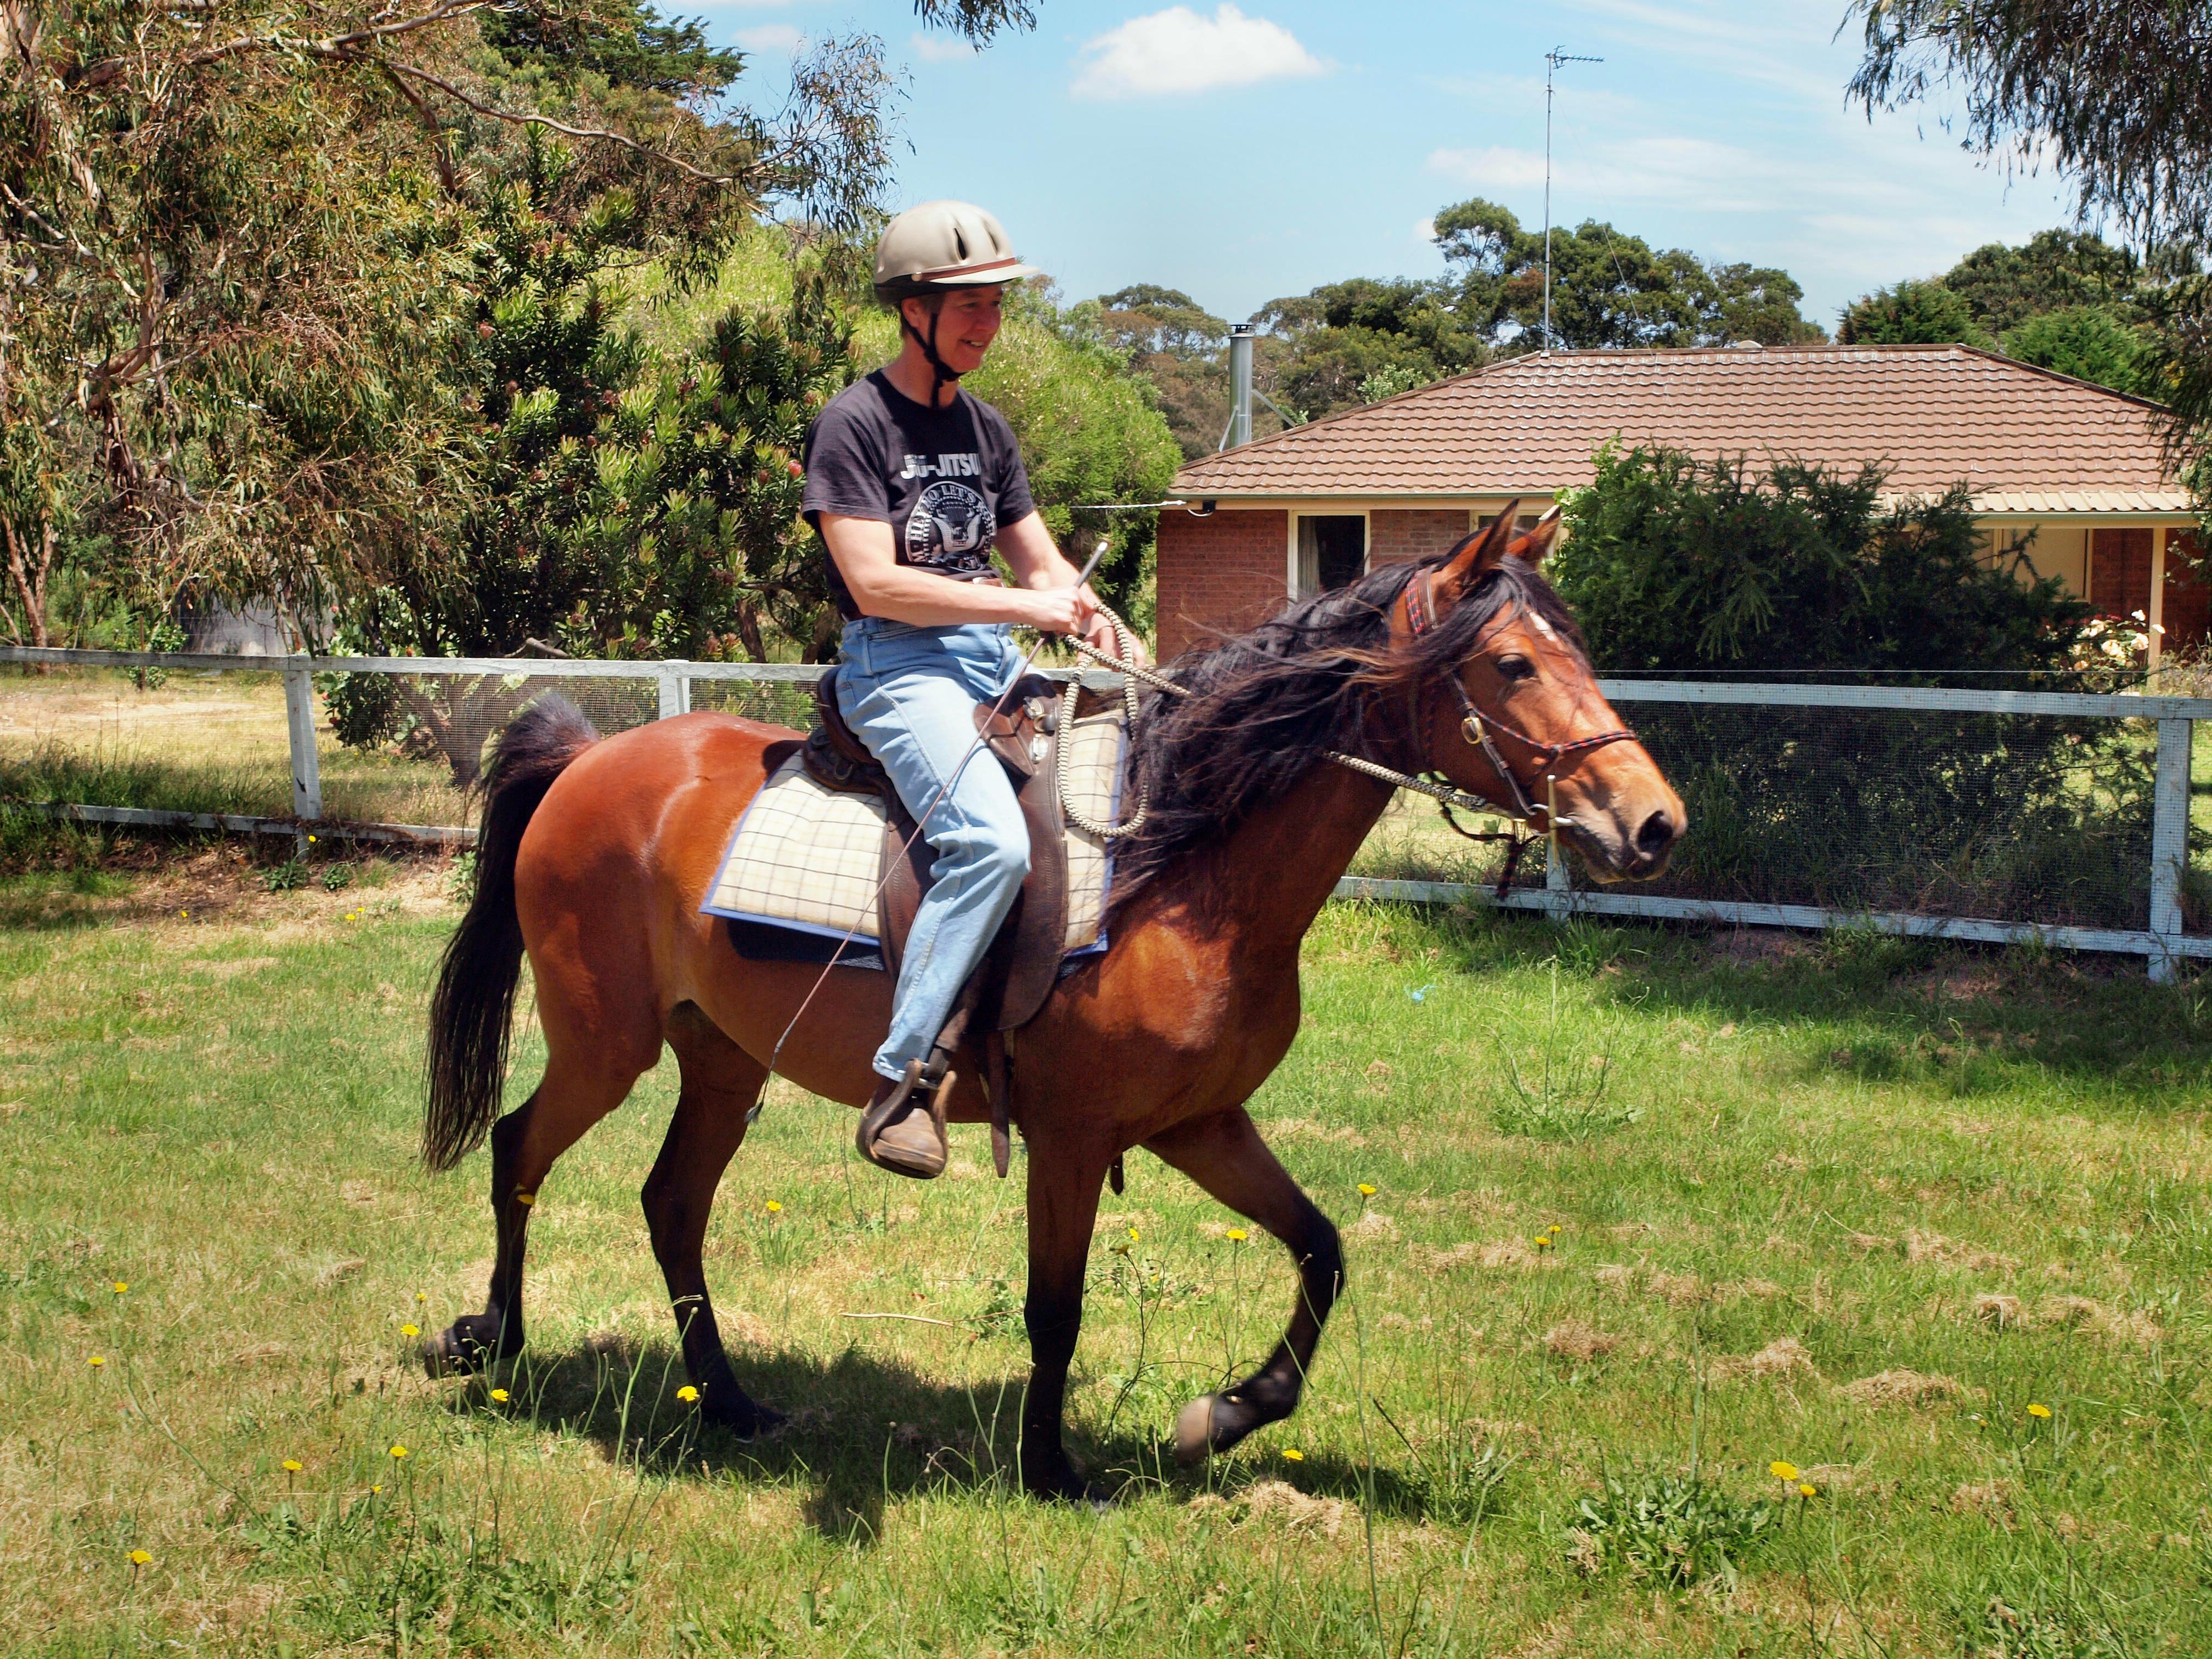 Riding-12.jpeg